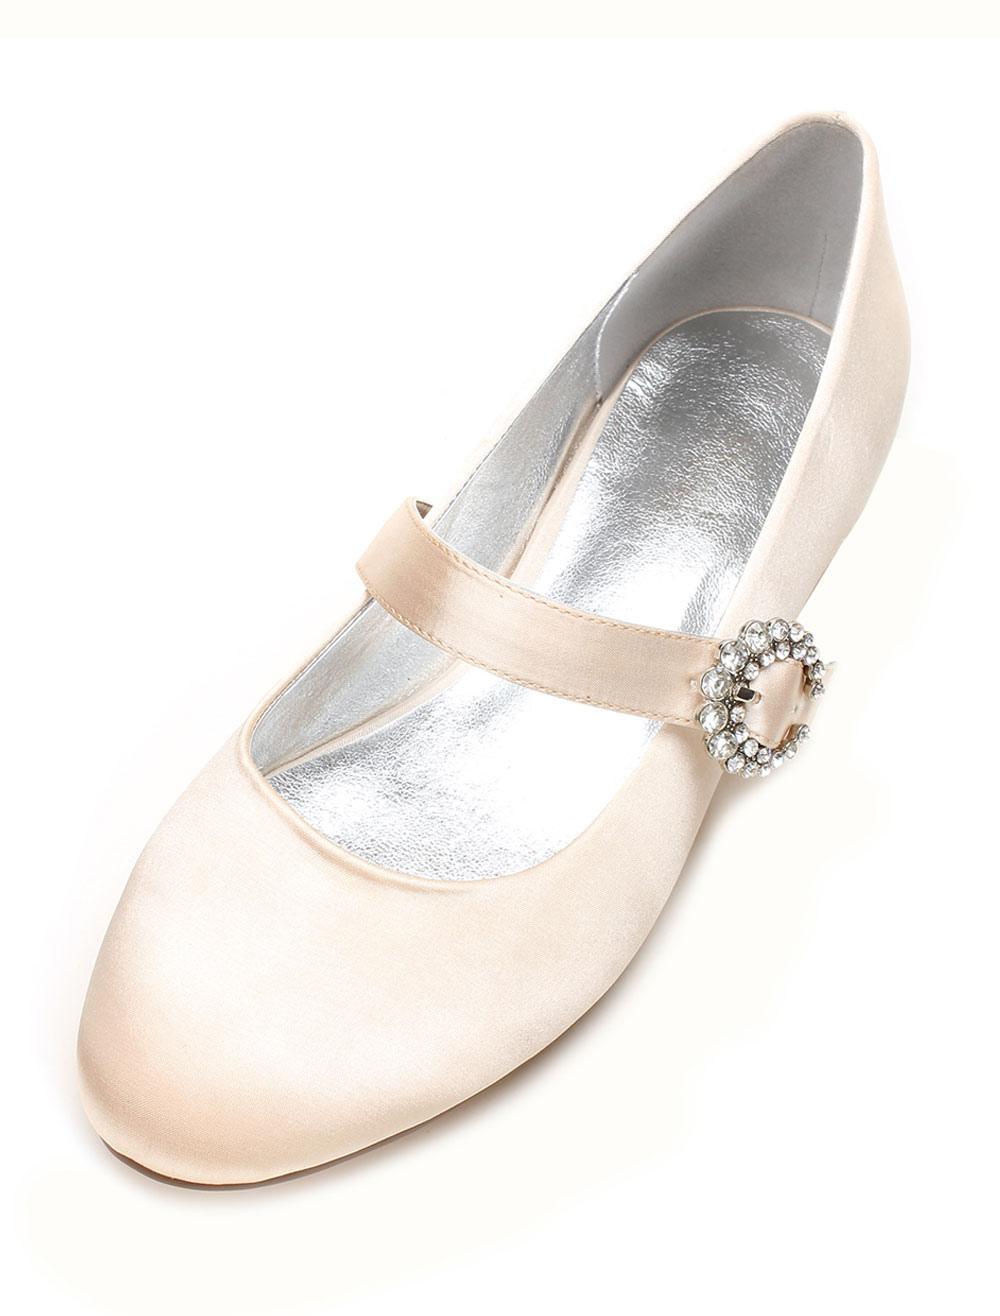 Champagne Bridesmaid Shoes Satin Wedding Shoes Round Toe Rhinestones Mary Jane Wedding Guest Shoes